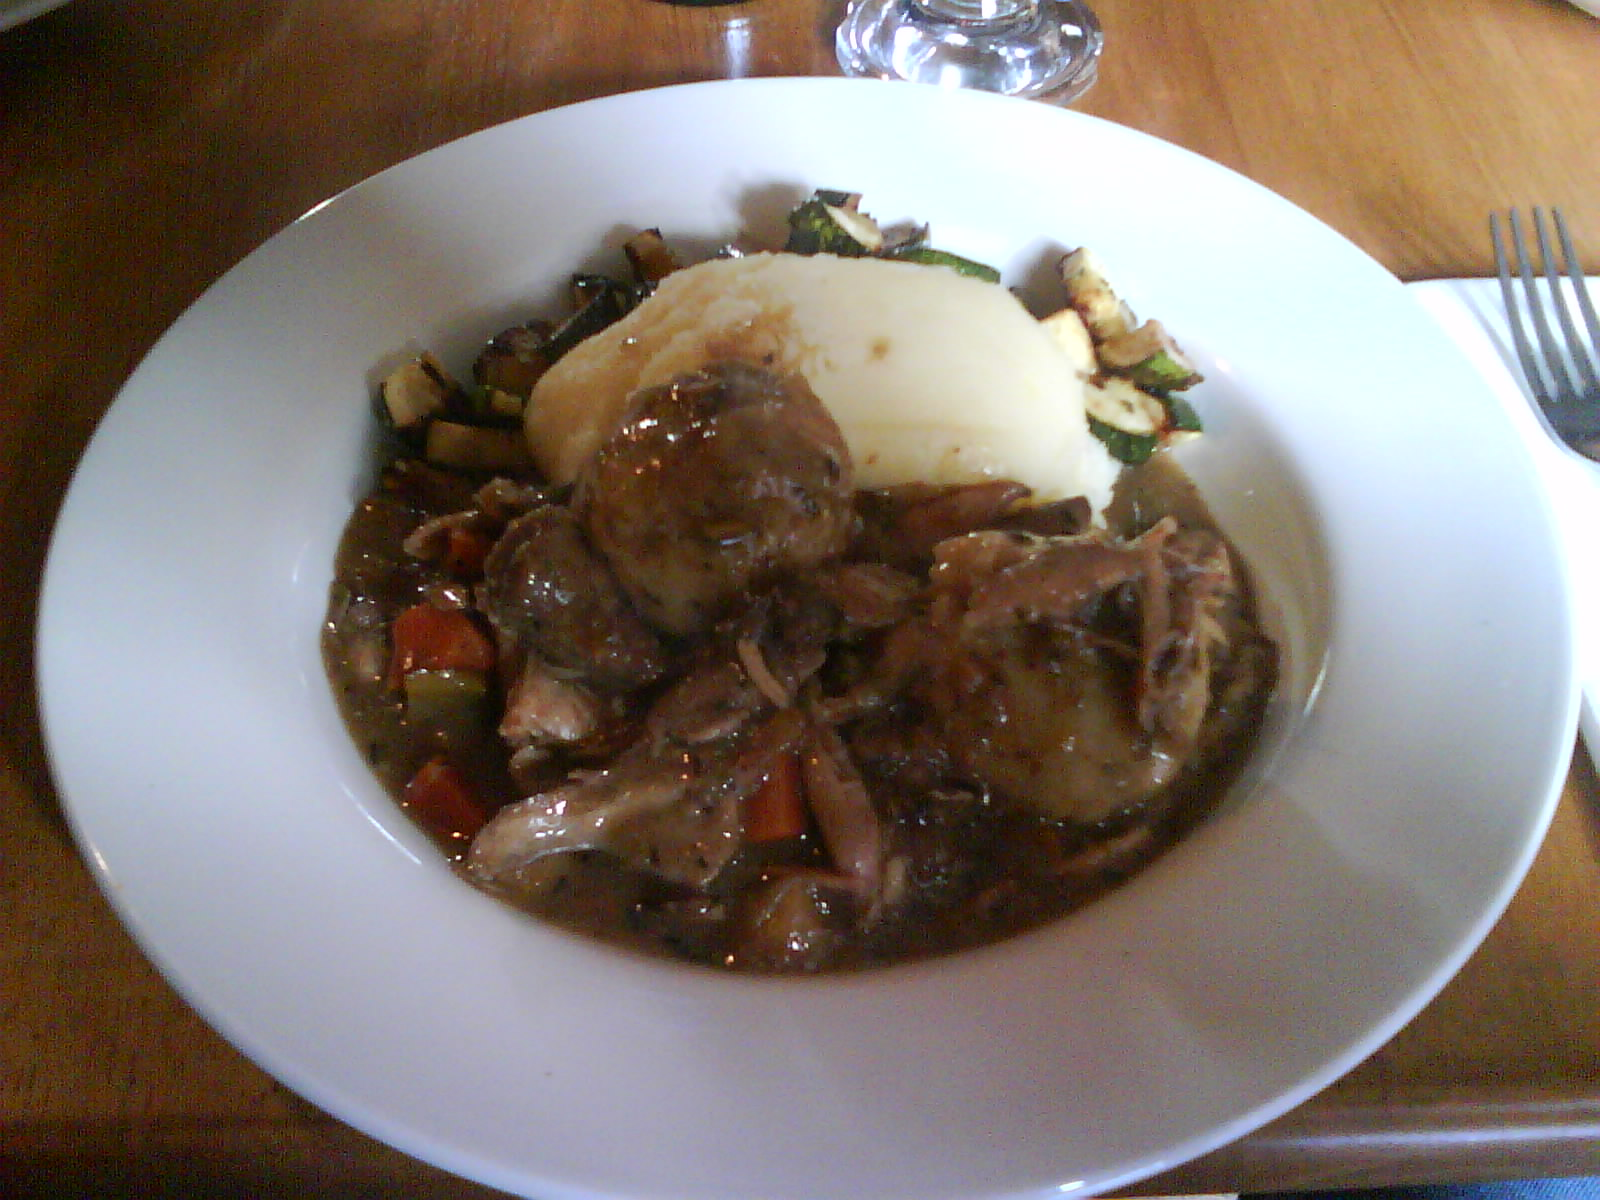 Rabbit and Venison stew